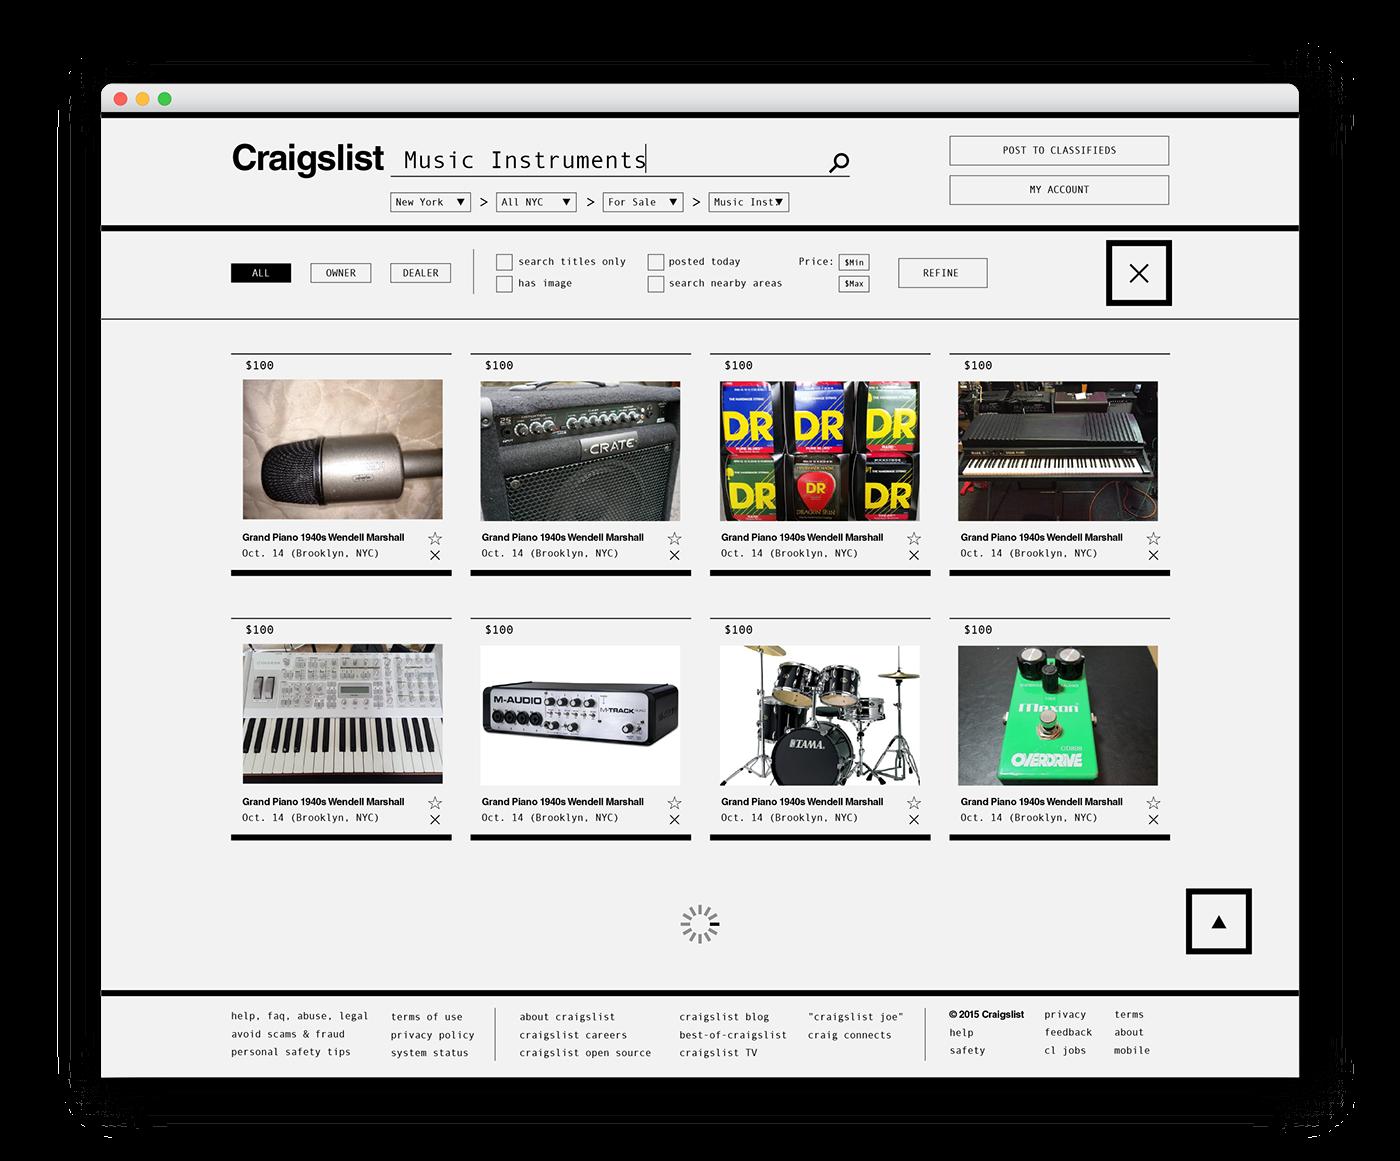 craigslist Craigs list redesign sva mfadesign black and white monochrome Listings